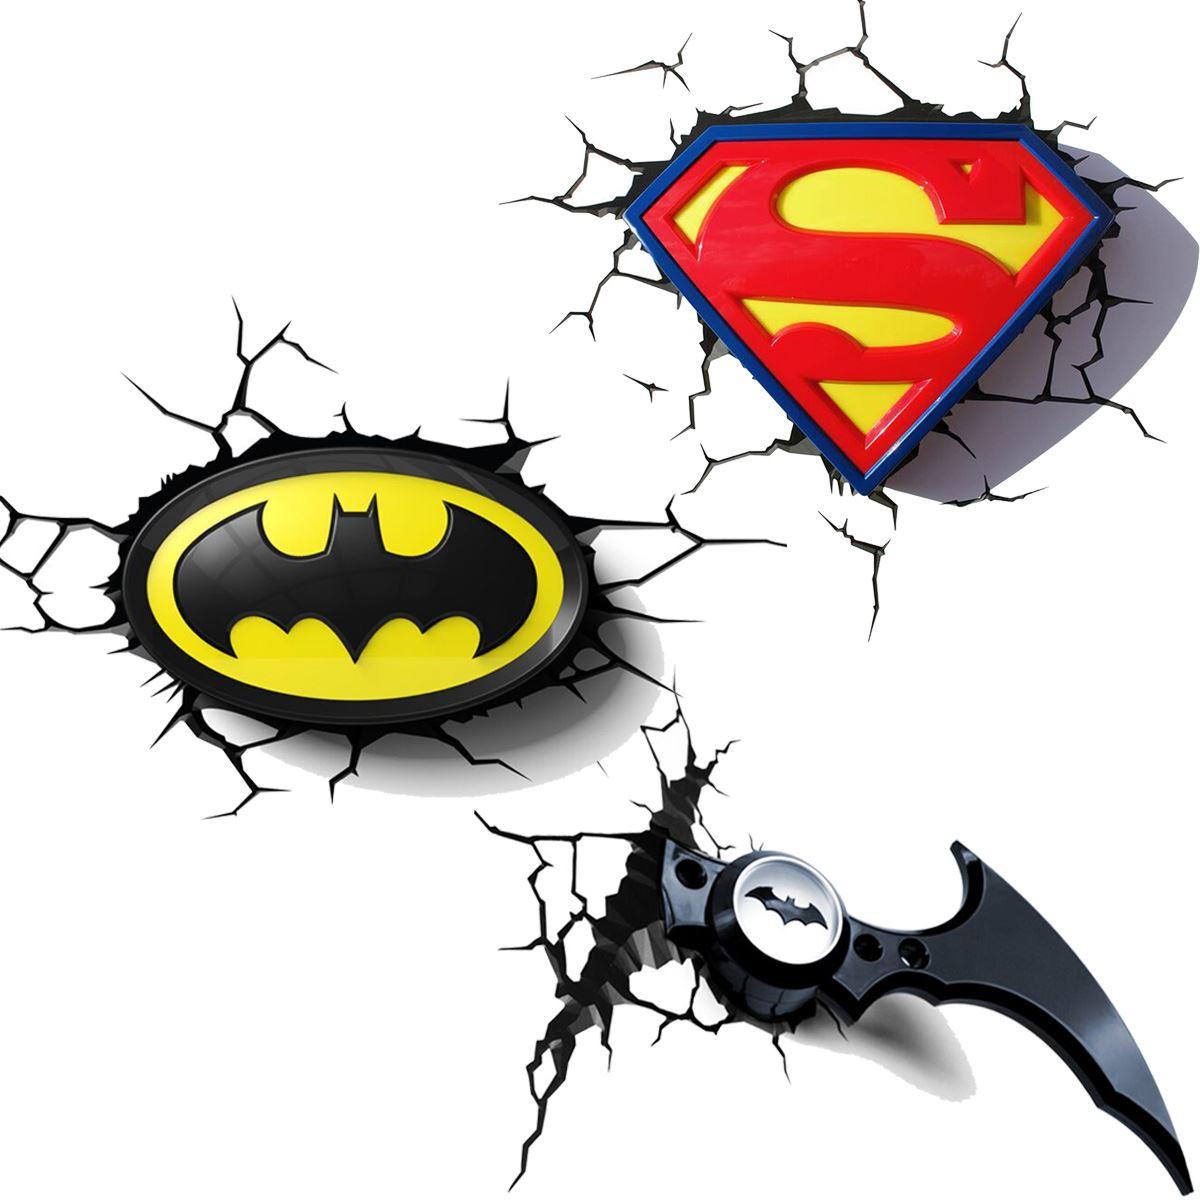 3d Wall Light Kmart : DC COMICS BATMAN & SUPERMAN 3D WALL LIGHTS NIGHTLIGHT BEDROOM LIGHTING FREE P+P